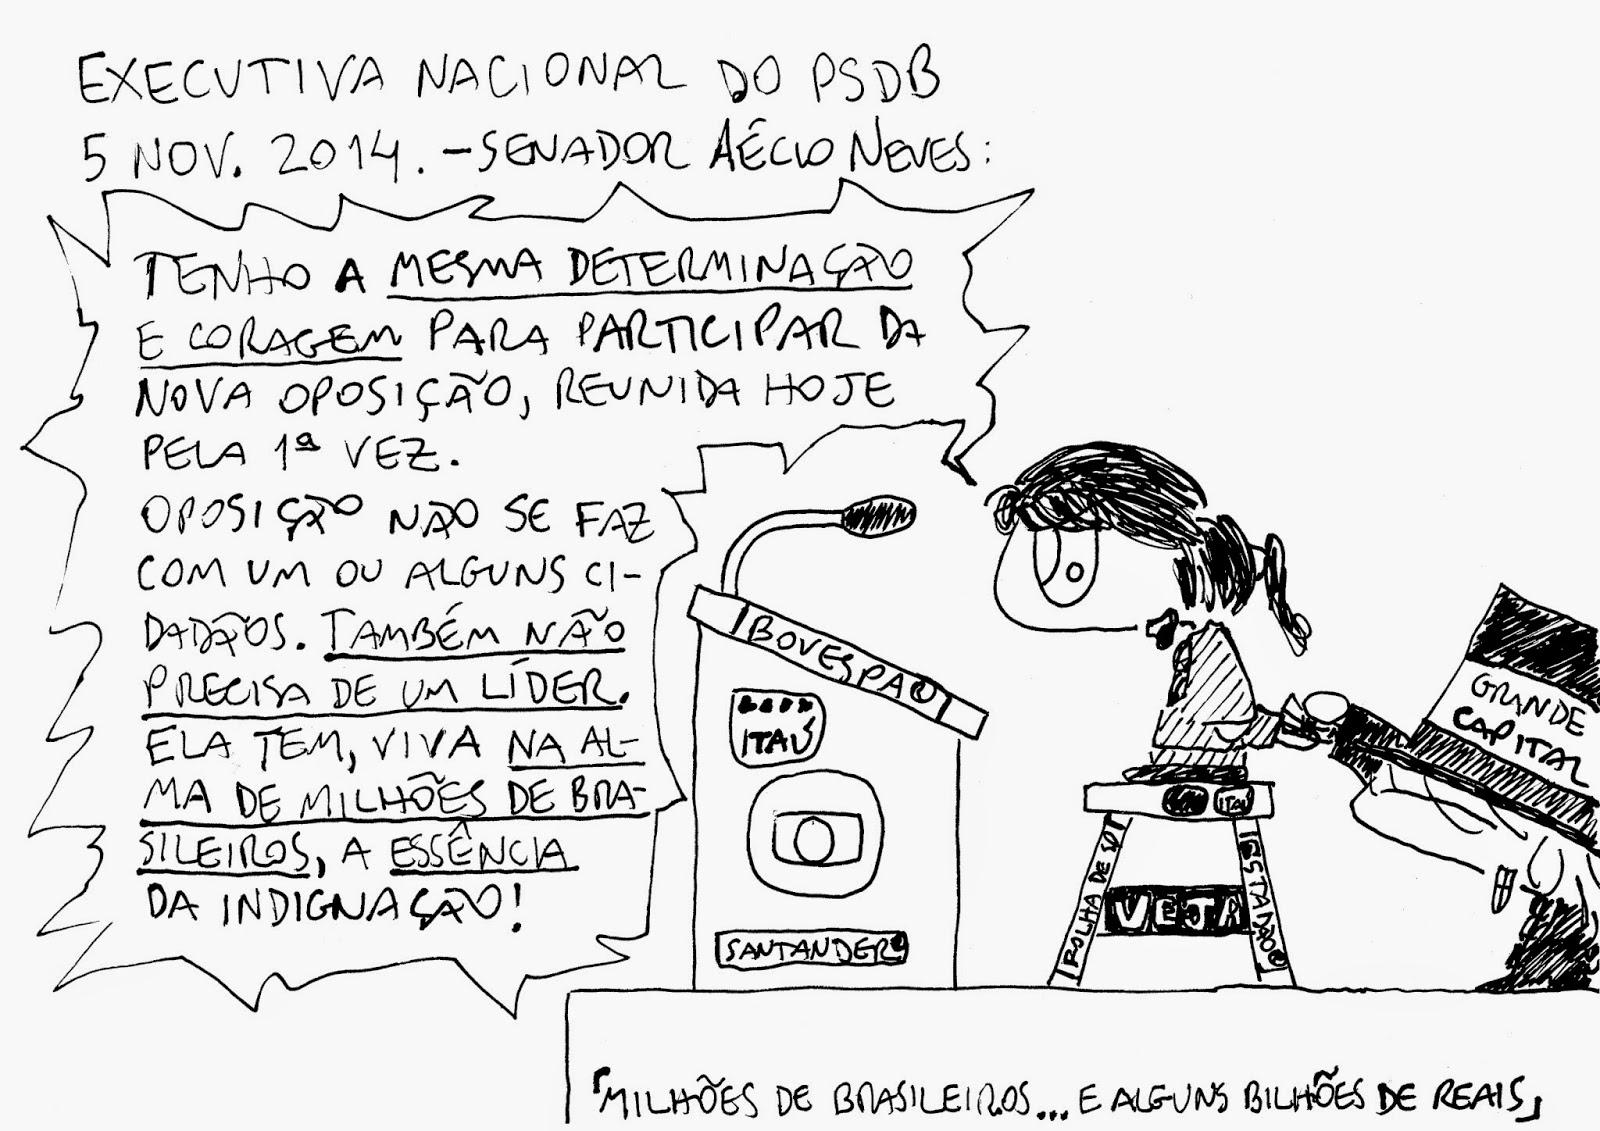 http://virgenskamikazes.blogspot.com.br/2014/11/mentira-tem-perna-curta-mas-nada-que-um.html